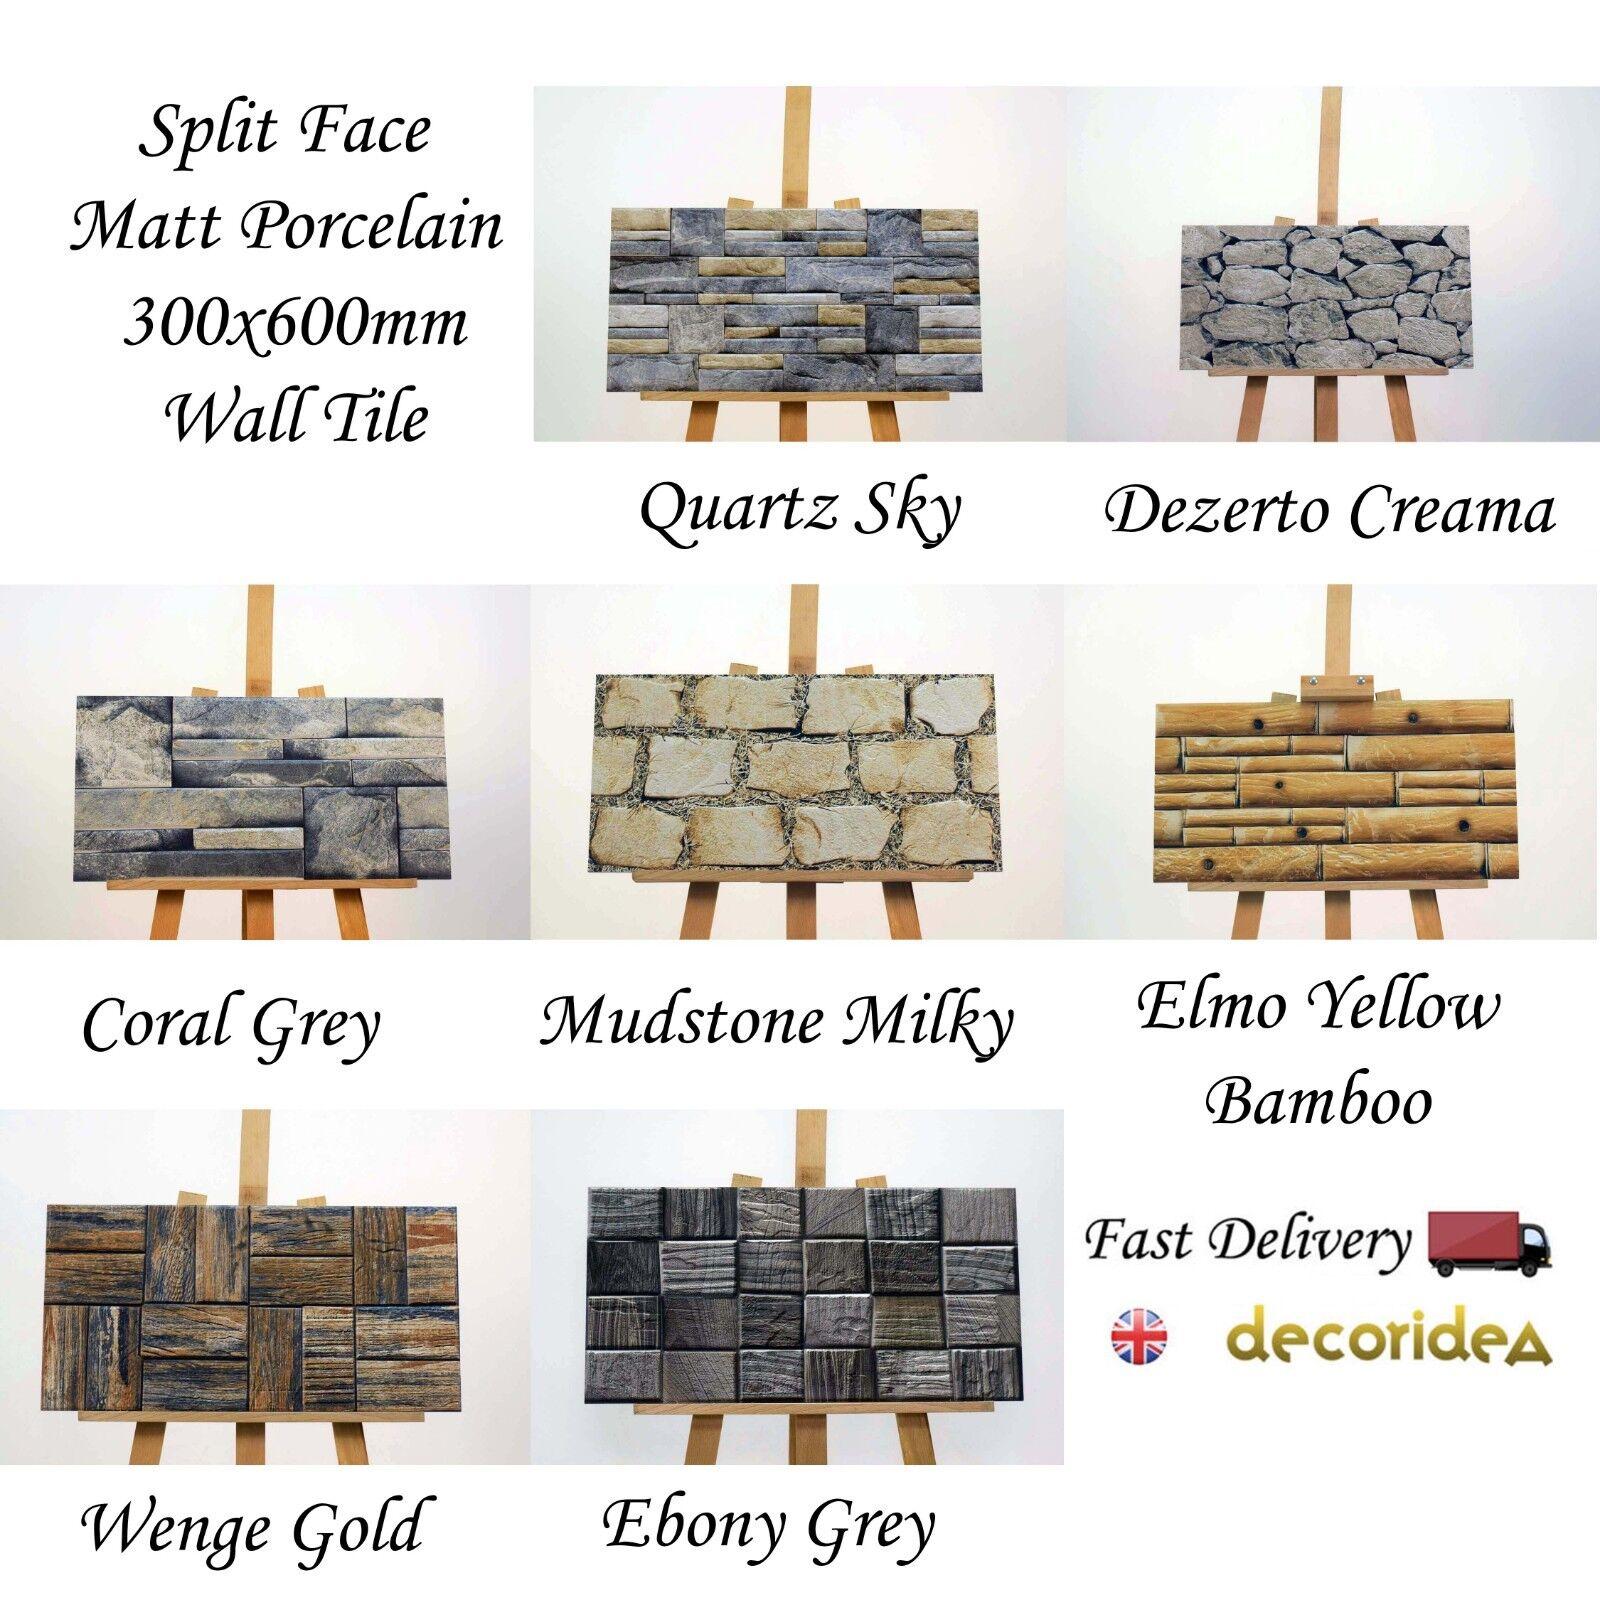 7 Split Face Matt Porcelain 300x600mm Cladding Wall Tile - 0.9sqm/box - 10.5mm